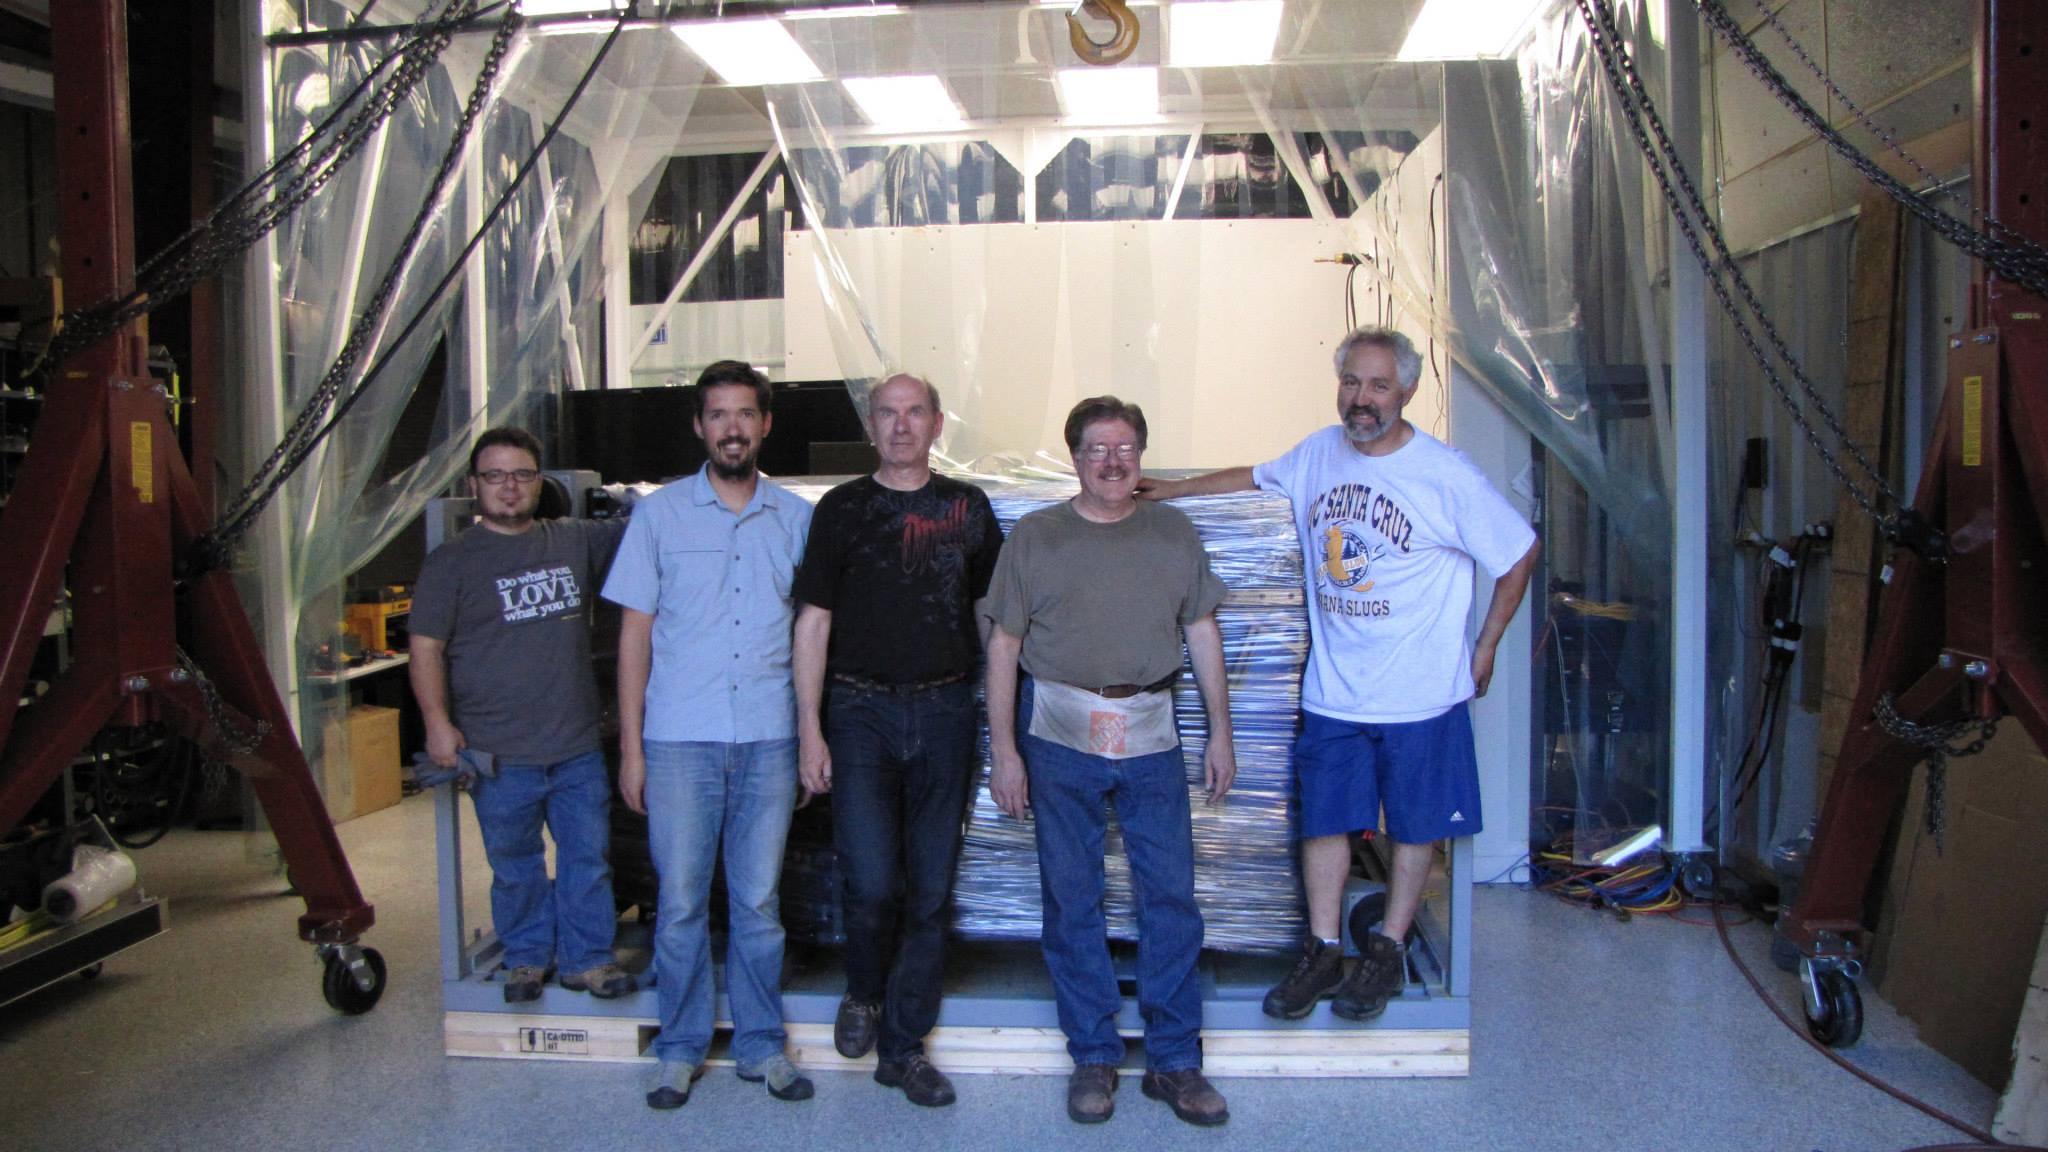 GPI packing team - with Daren Dillon, Gaston Gausachs, Kris Kaputa, Jim Ward and Andre Anthony